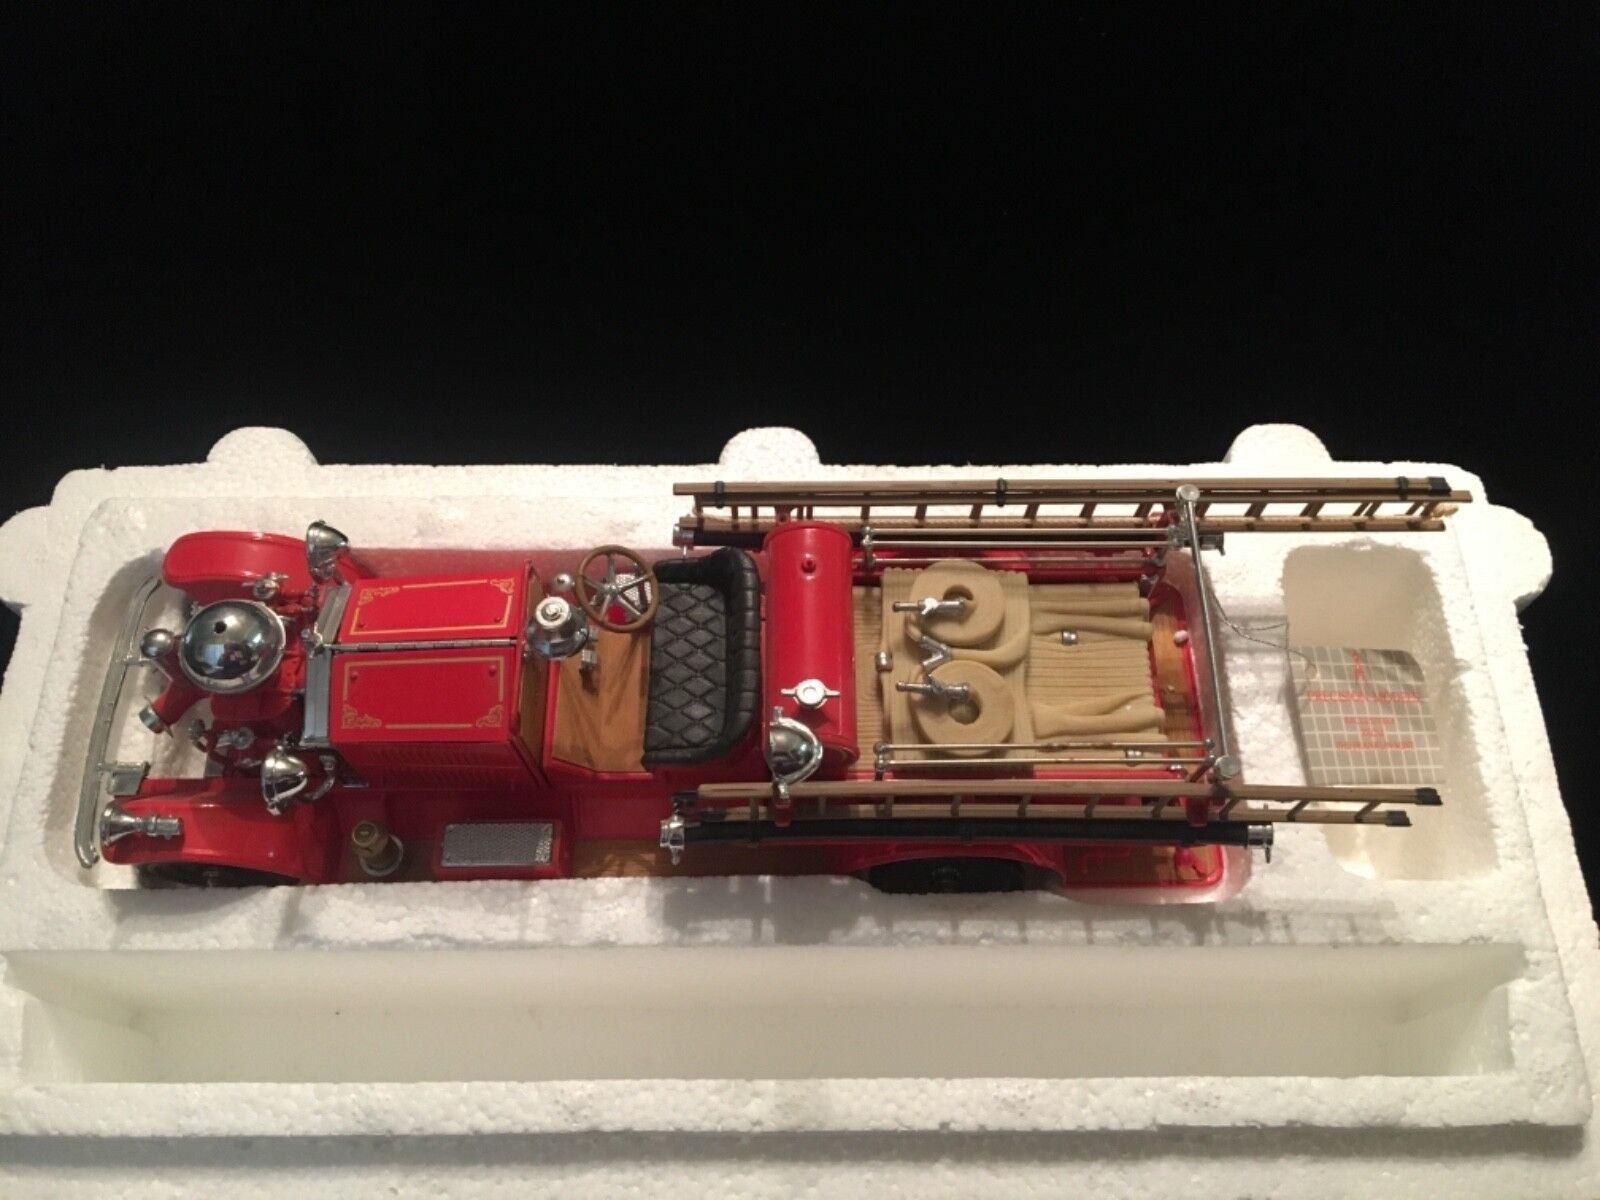 AHRENS 1922 FOX R-K-4 Pumper Fire Engine - Franklin Mint